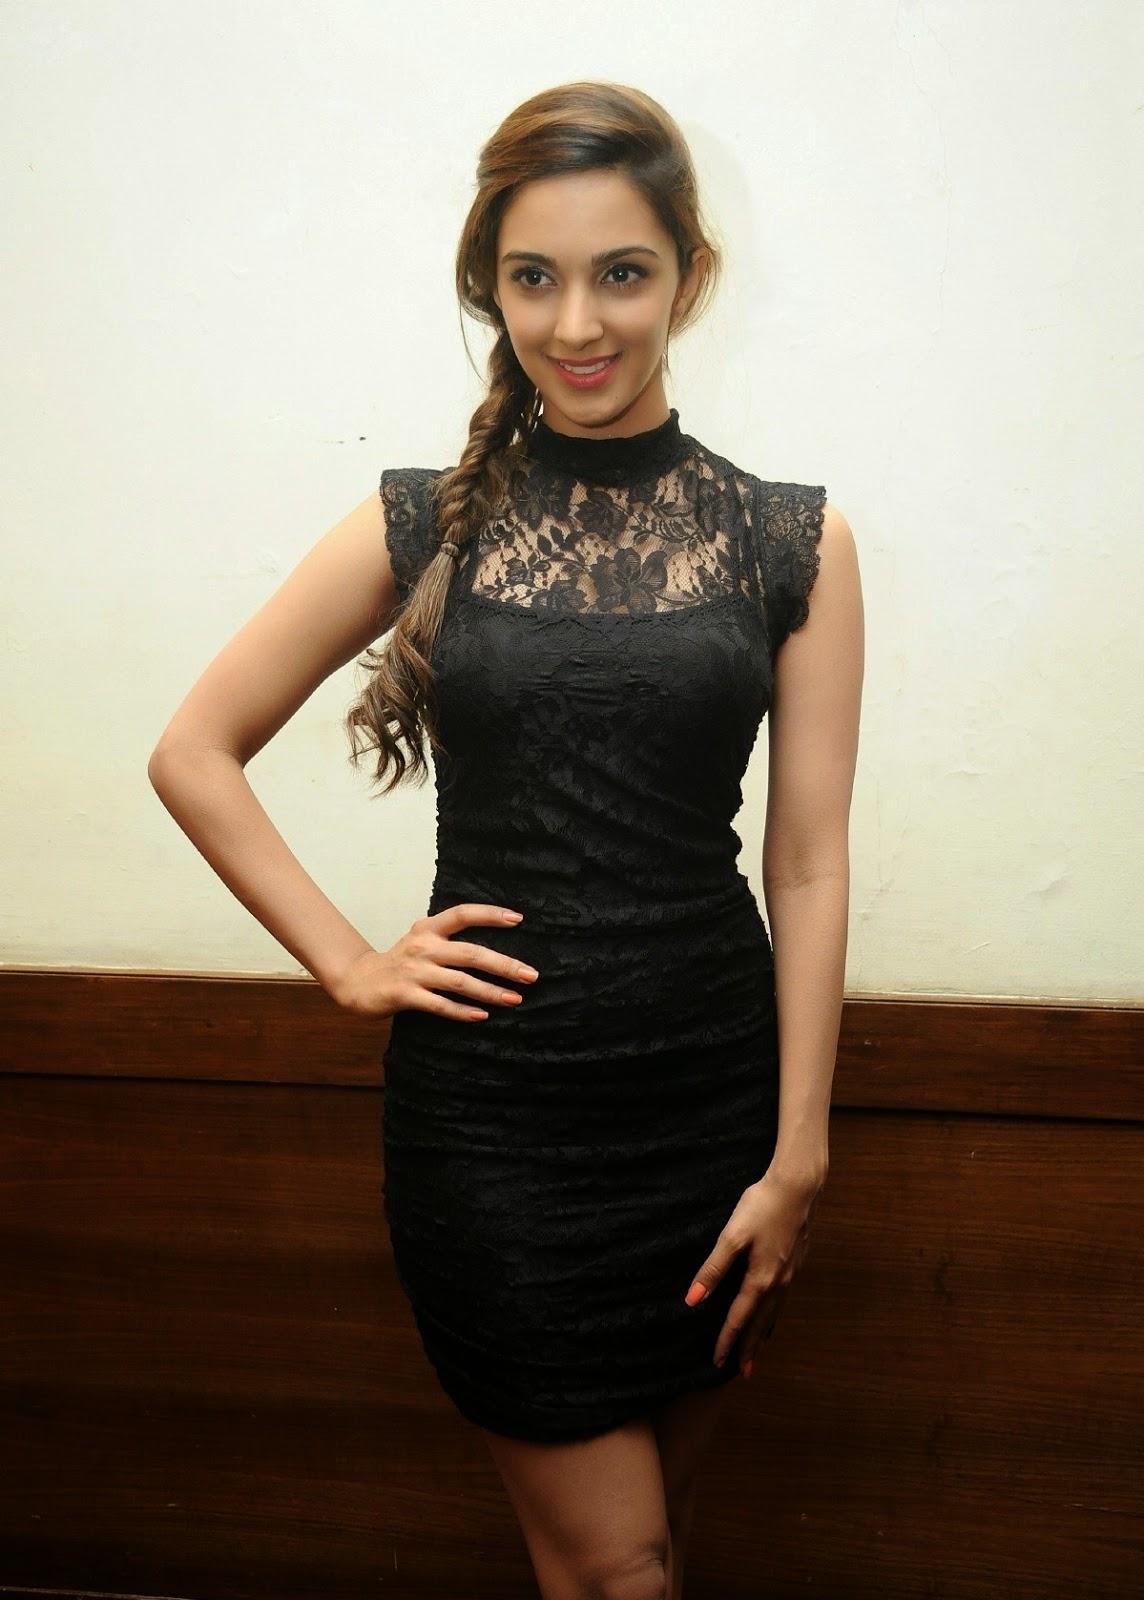 High Quality Bollywood Celebrity Pictures: Kiara Advani